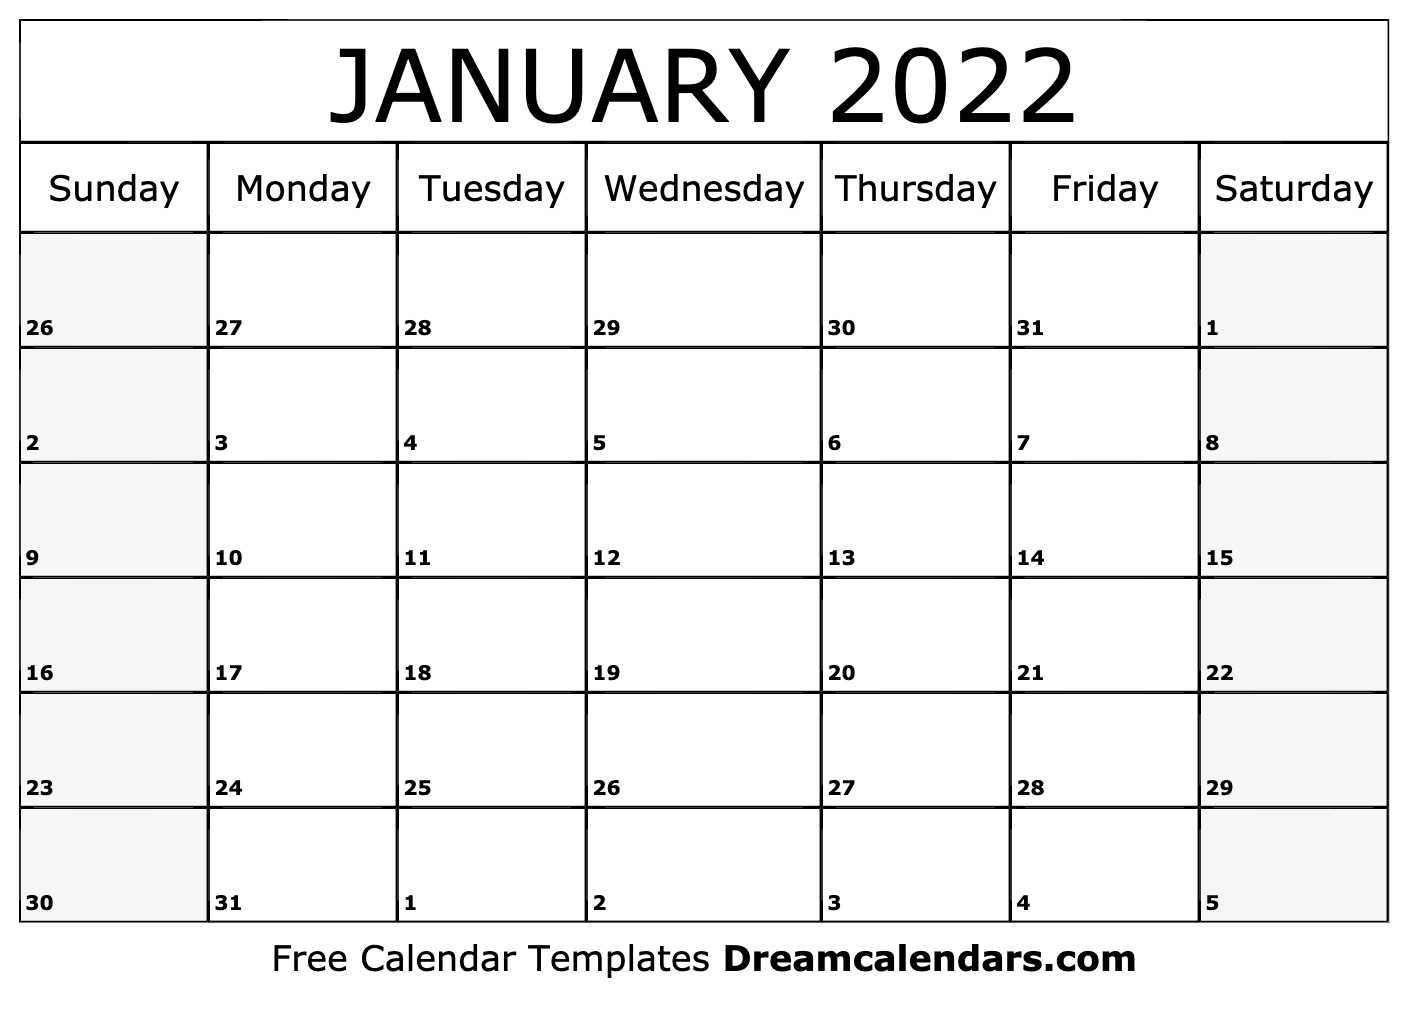 Ucf Spring 2022 Calendar.January 2022 Calendar Free Blank Printable Templates